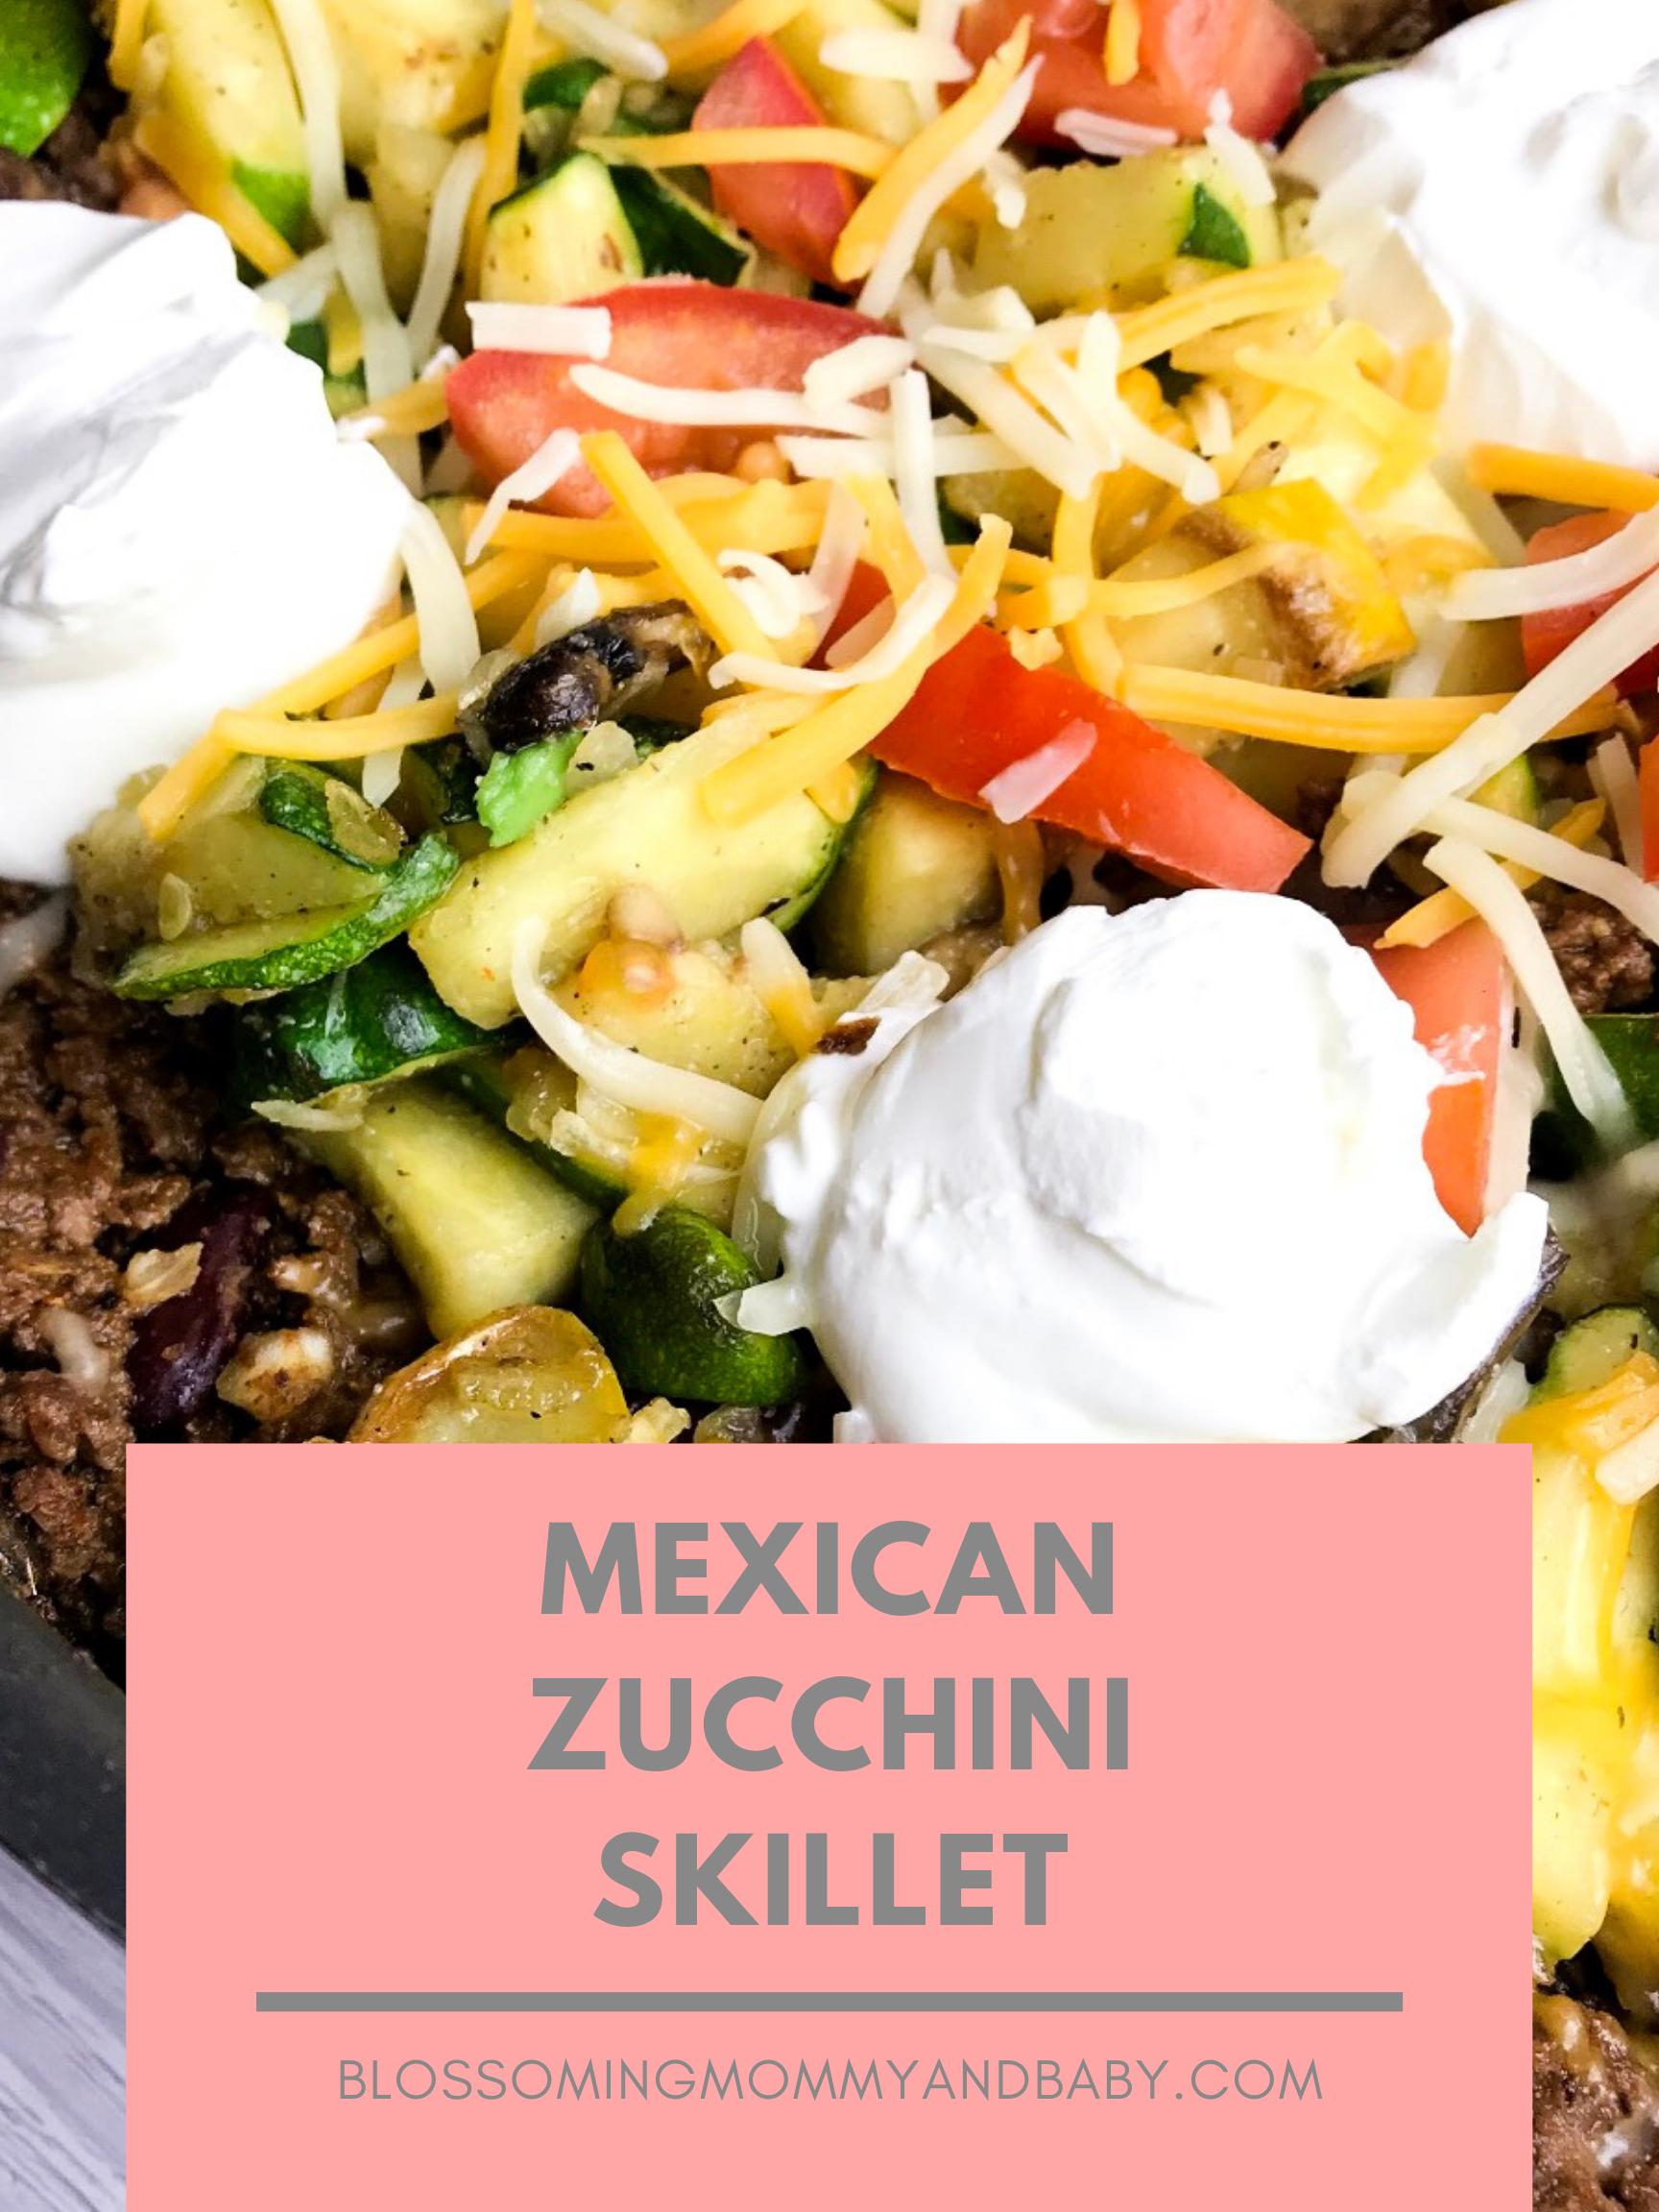 Mexican Zucchini Skillet